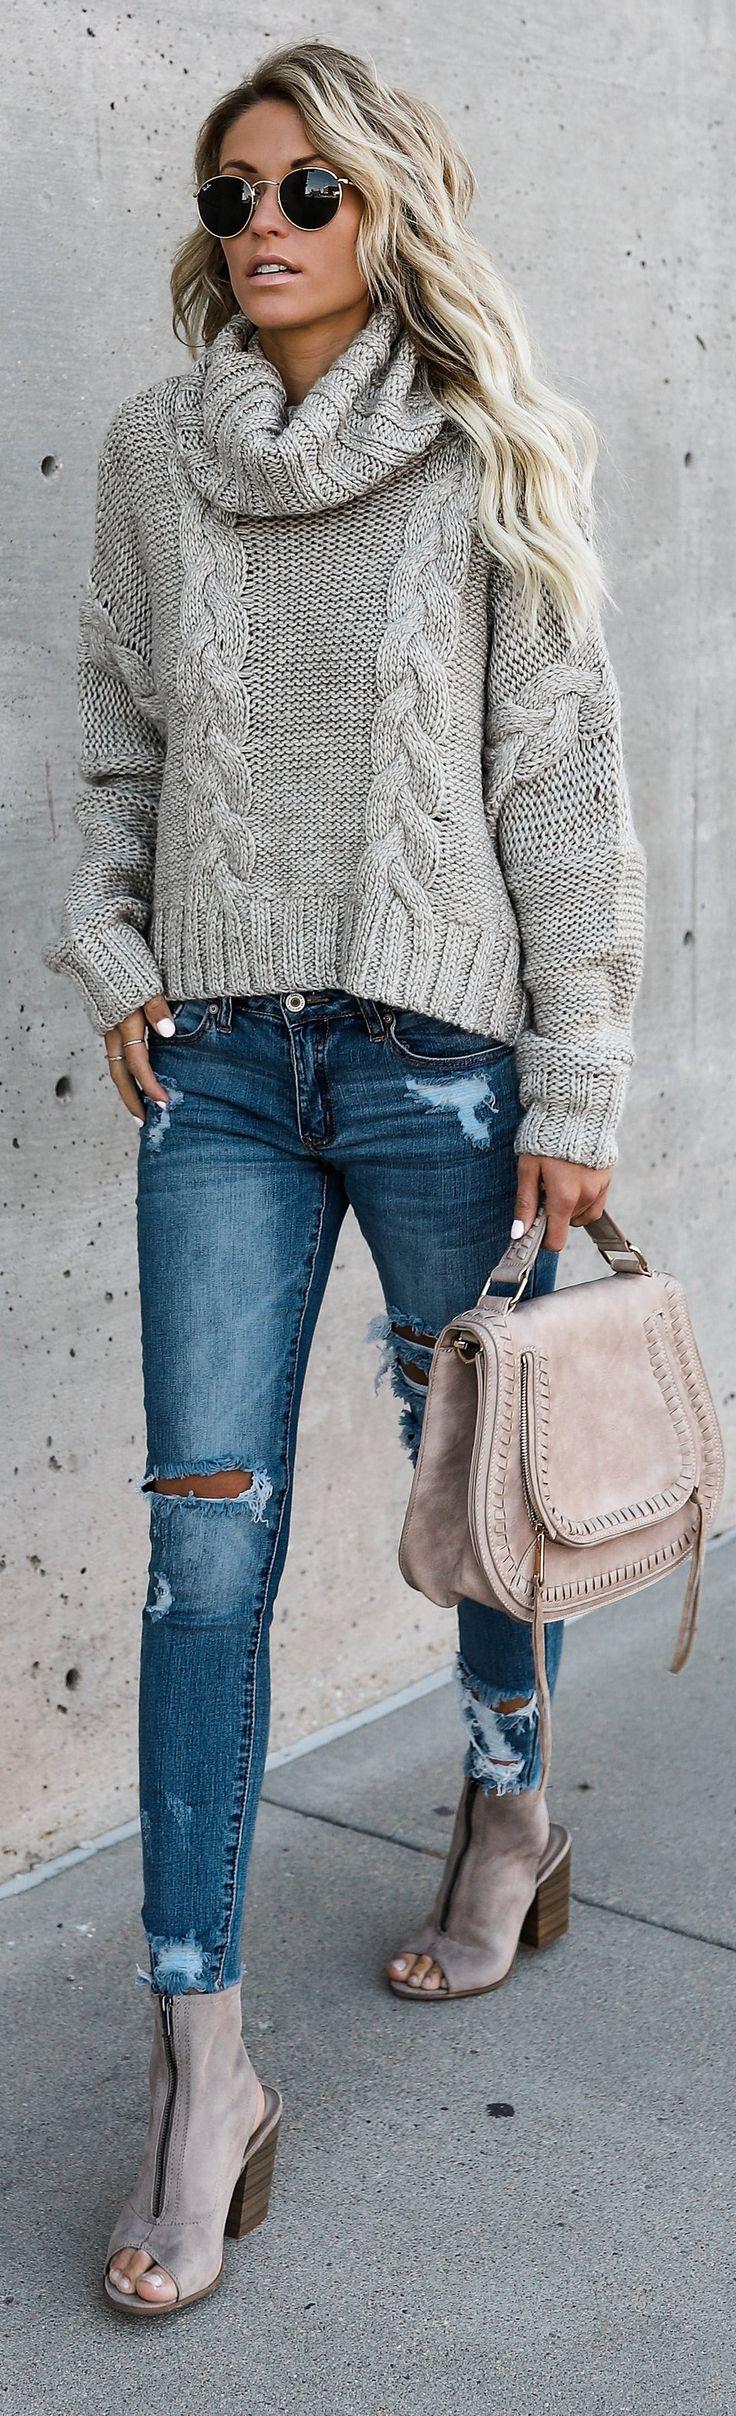 Casual Fall Fashion | Street Fashion #streetstyle